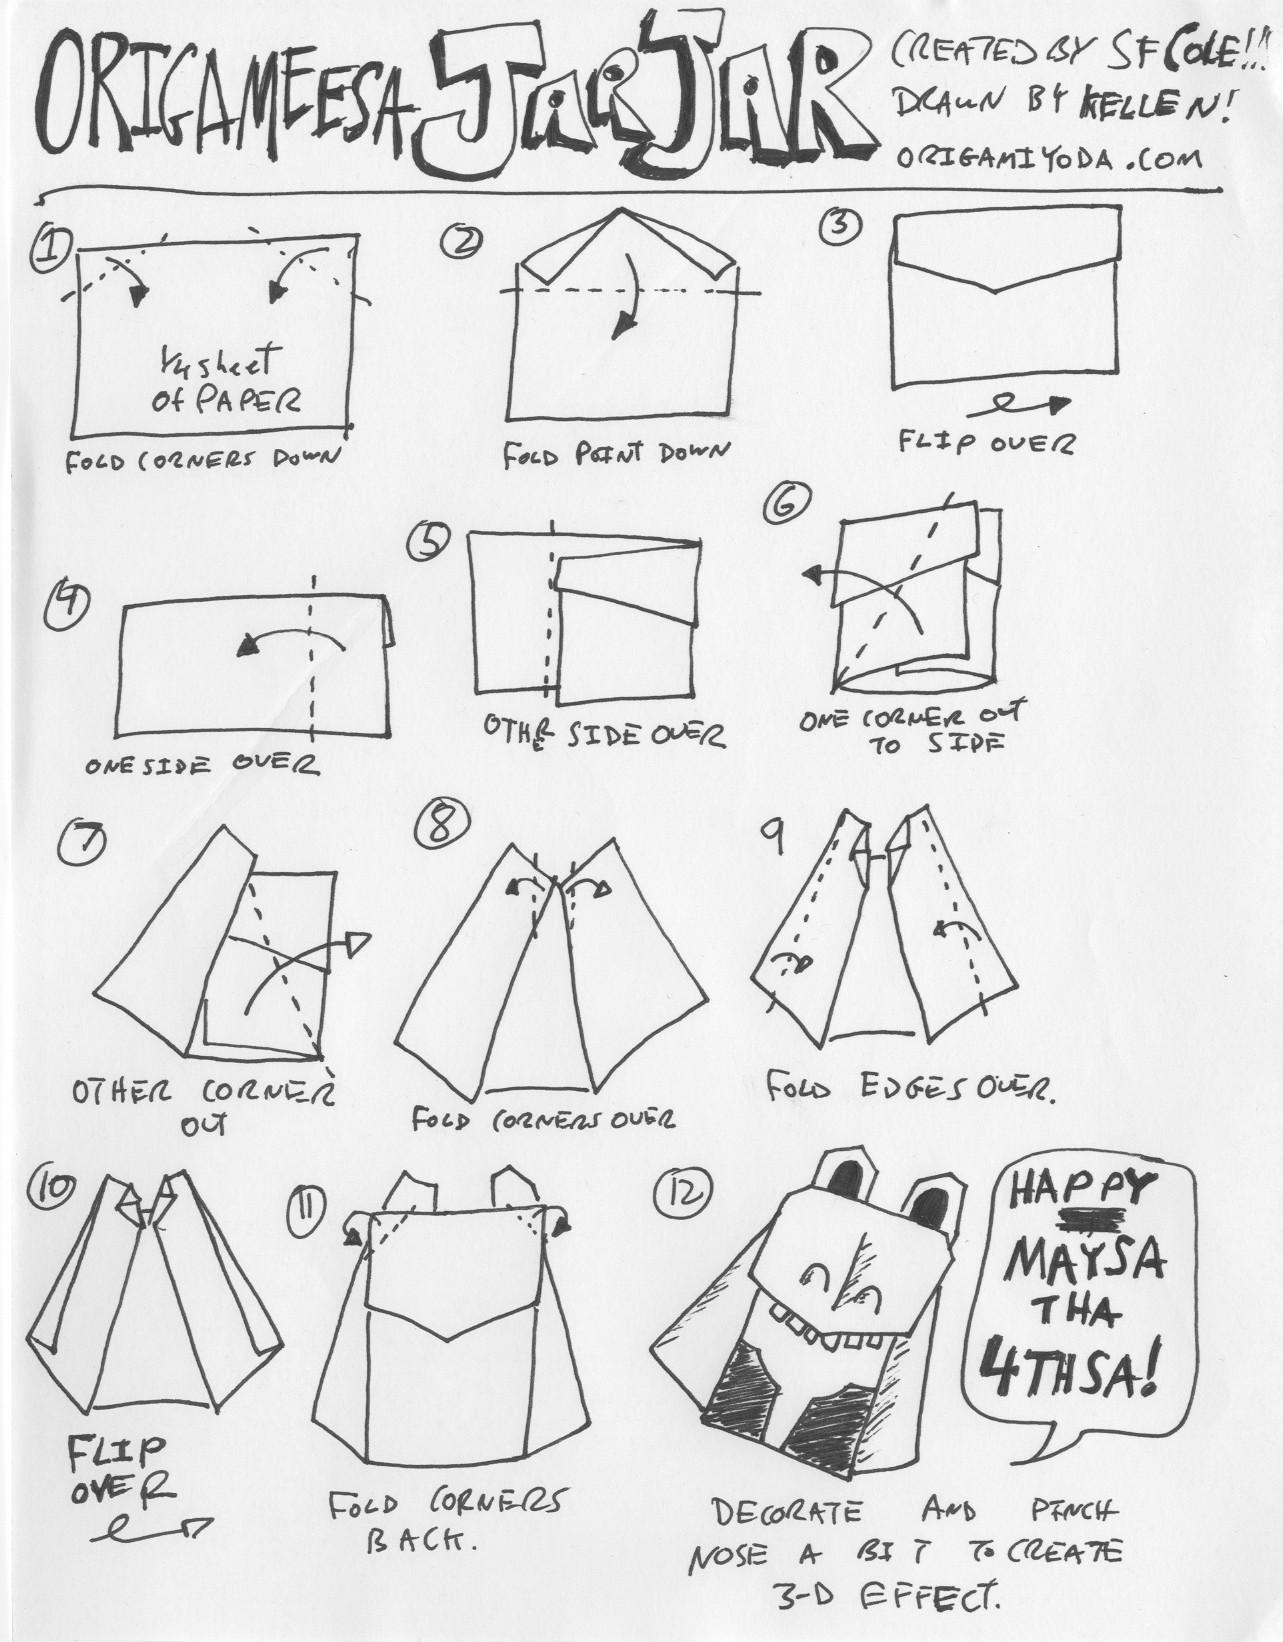 Origami Jar Jar Binks